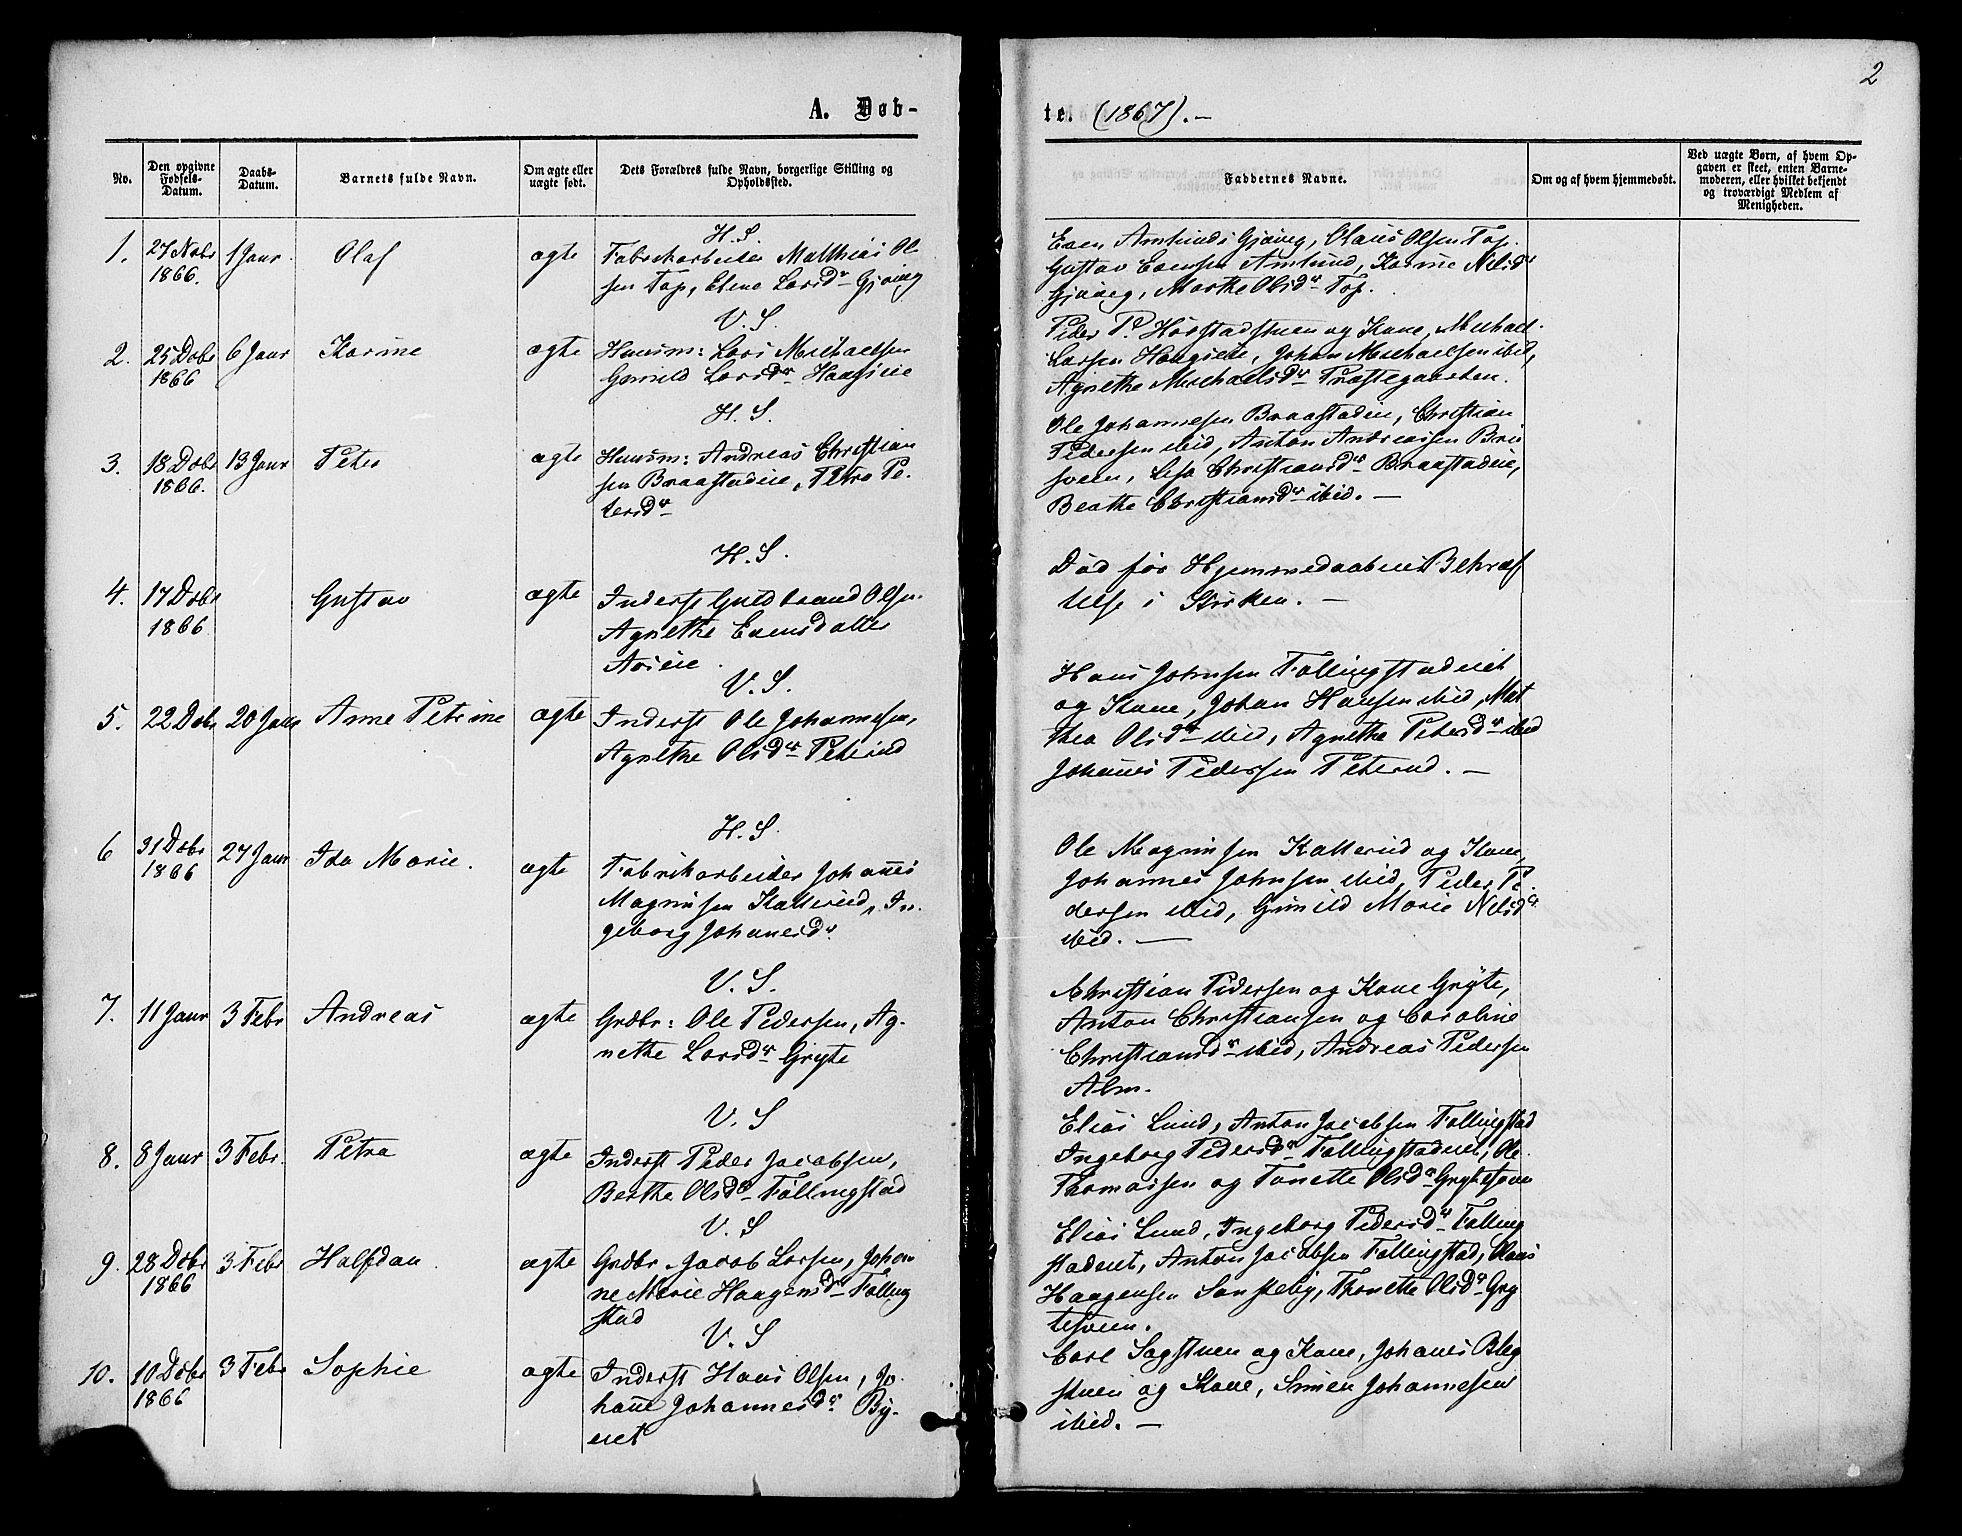 SAH, Vardal prestekontor, H/Ha/Haa/L0007: Ministerialbok nr. 7, 1867-1878, s. 2